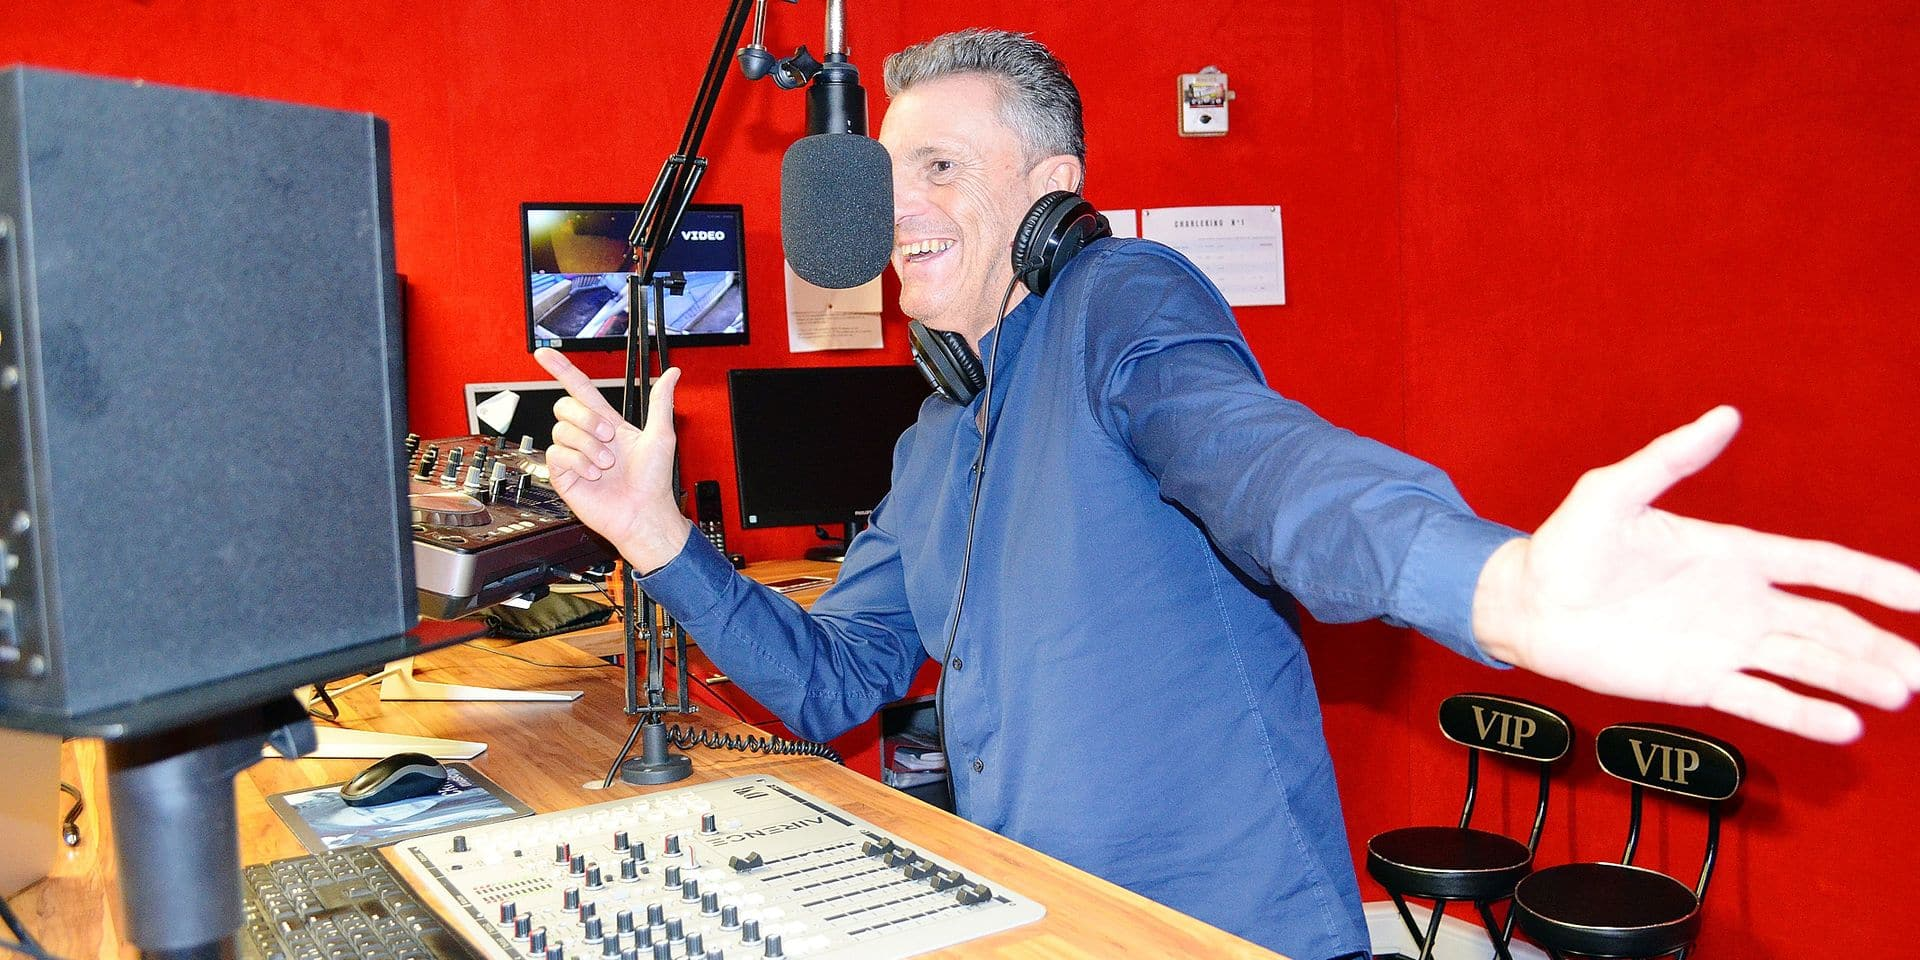 DJ Foxy au micro depuis 40 ans